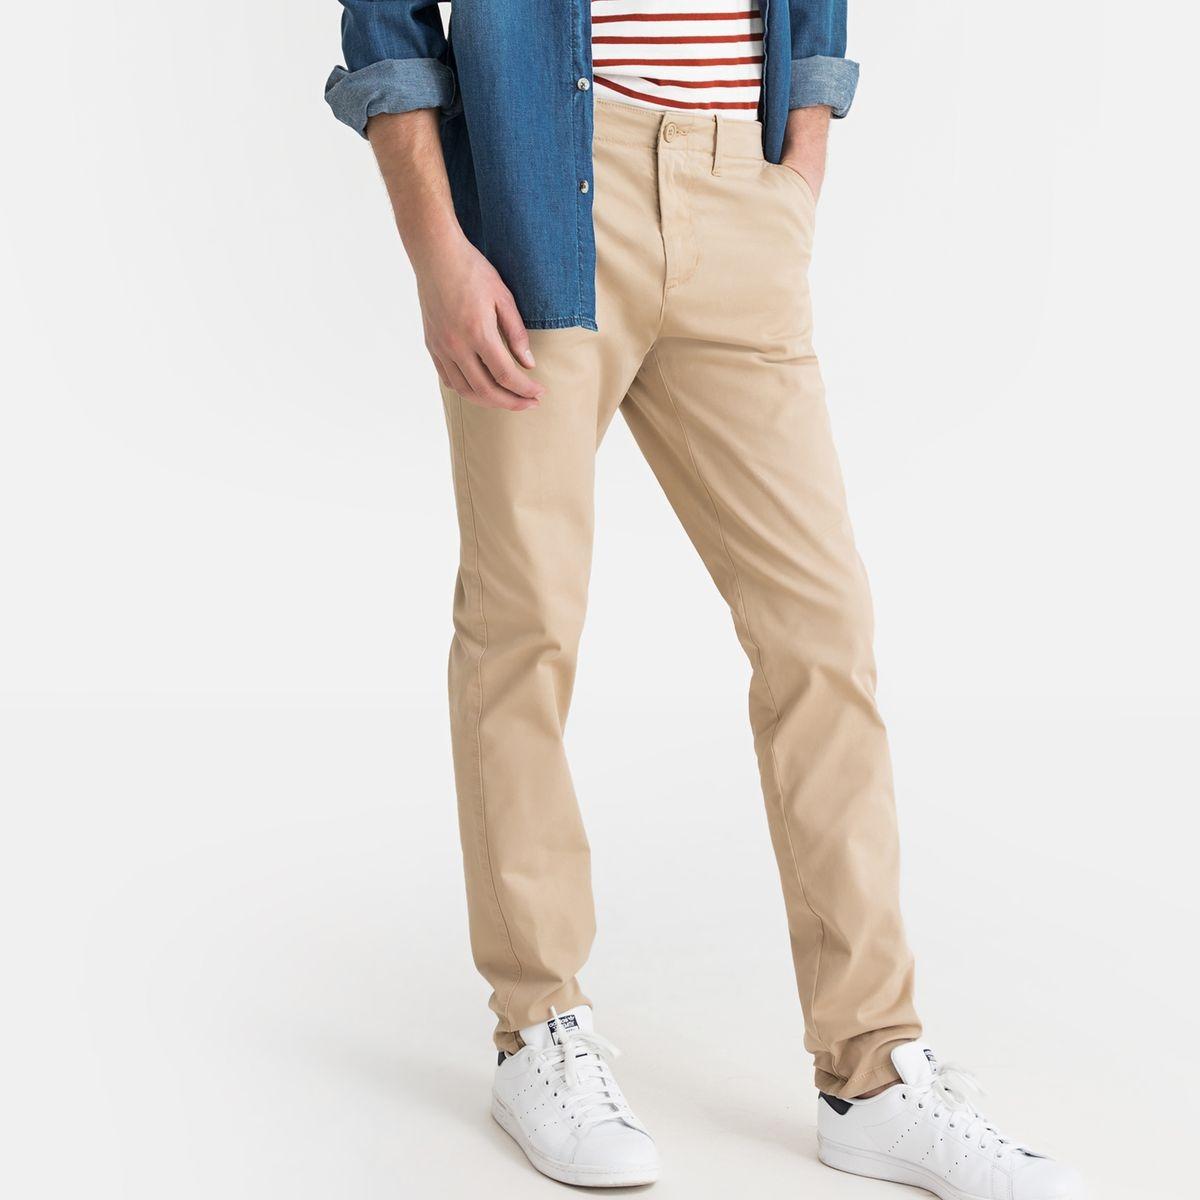 Personna Dockers Dockers Pantalon Grand Et Grand Et Pantalon Pantalon Personna Dockers N8wm0n